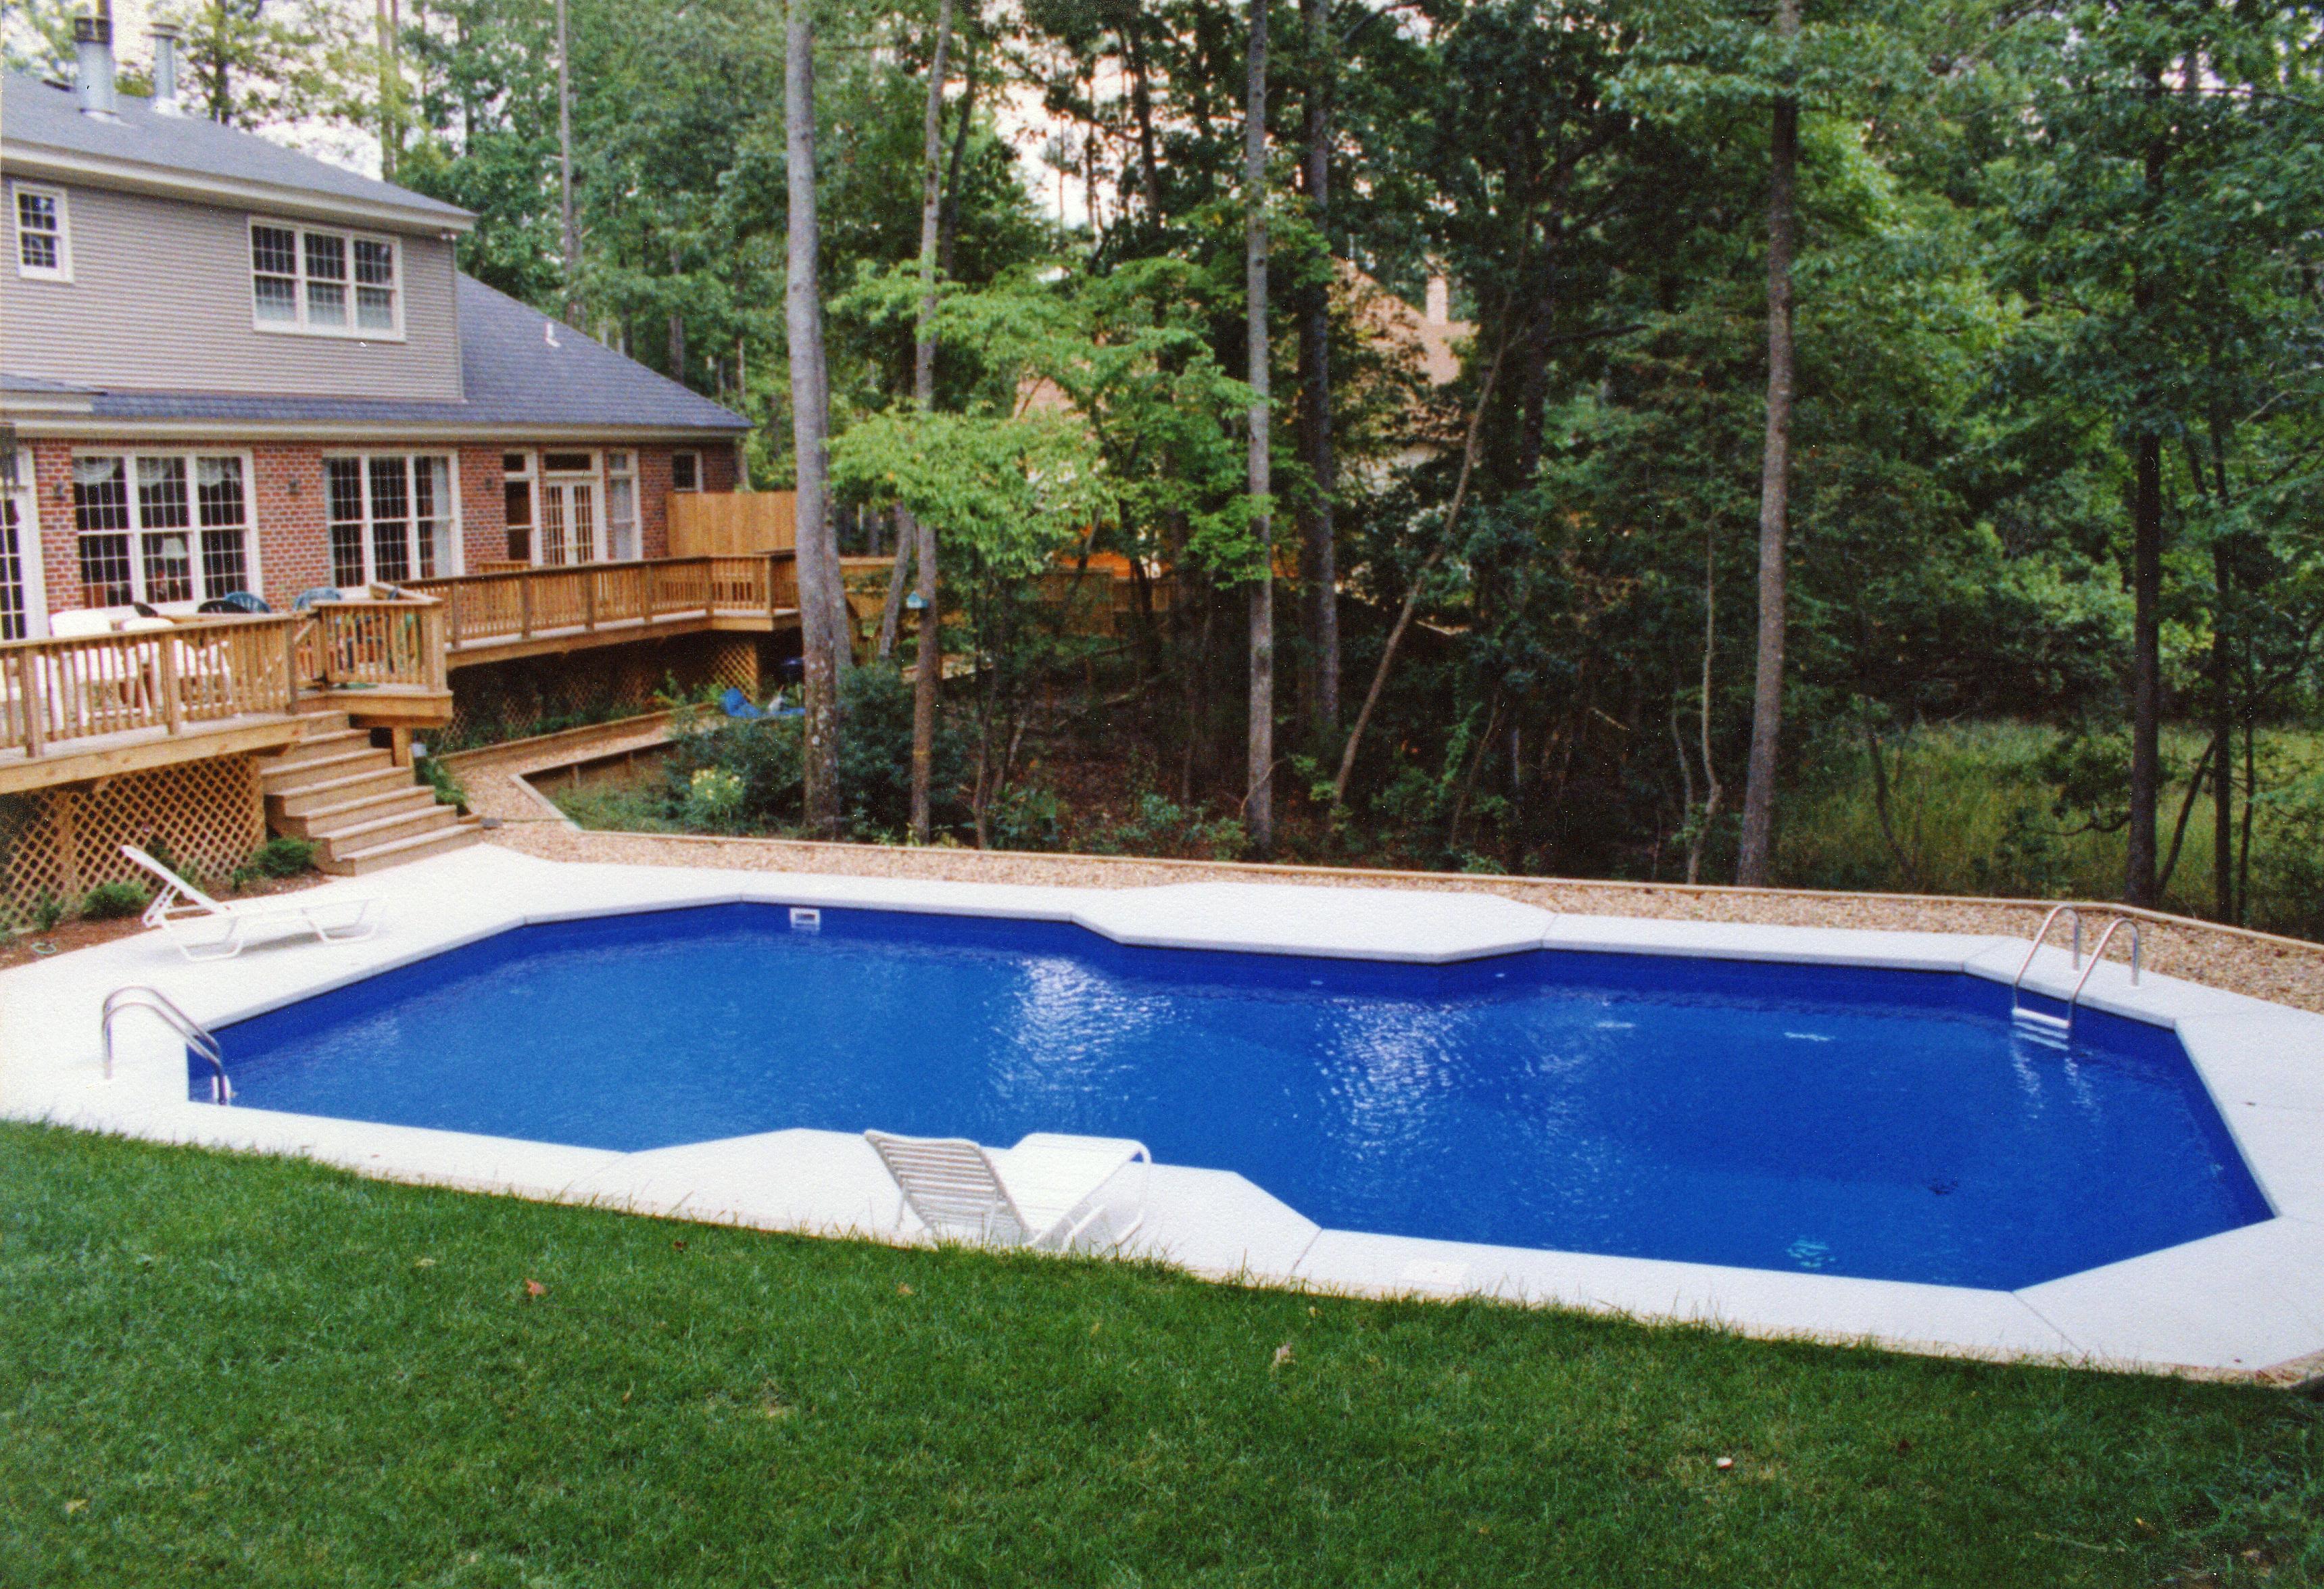 Classic liner pool 4